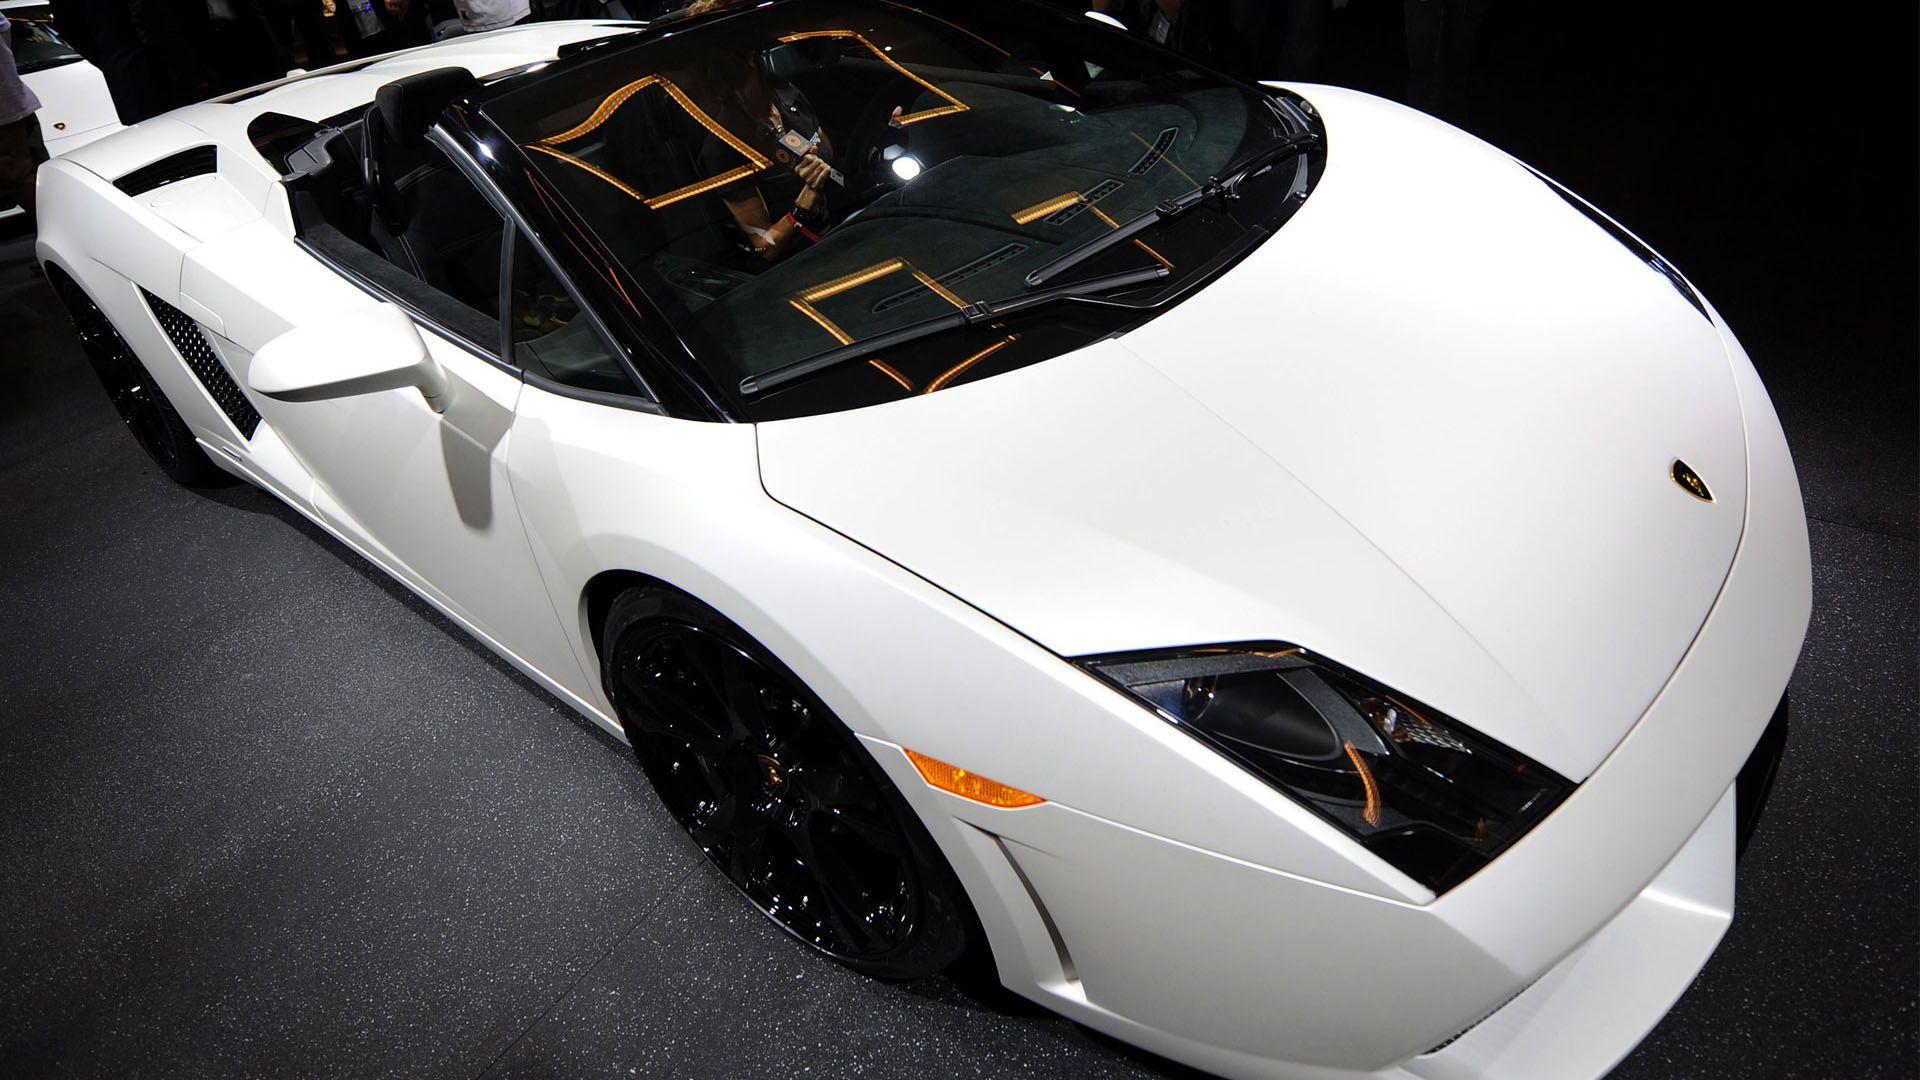 lamborghini super sport car – hd wallpapers 1080p cars | places to